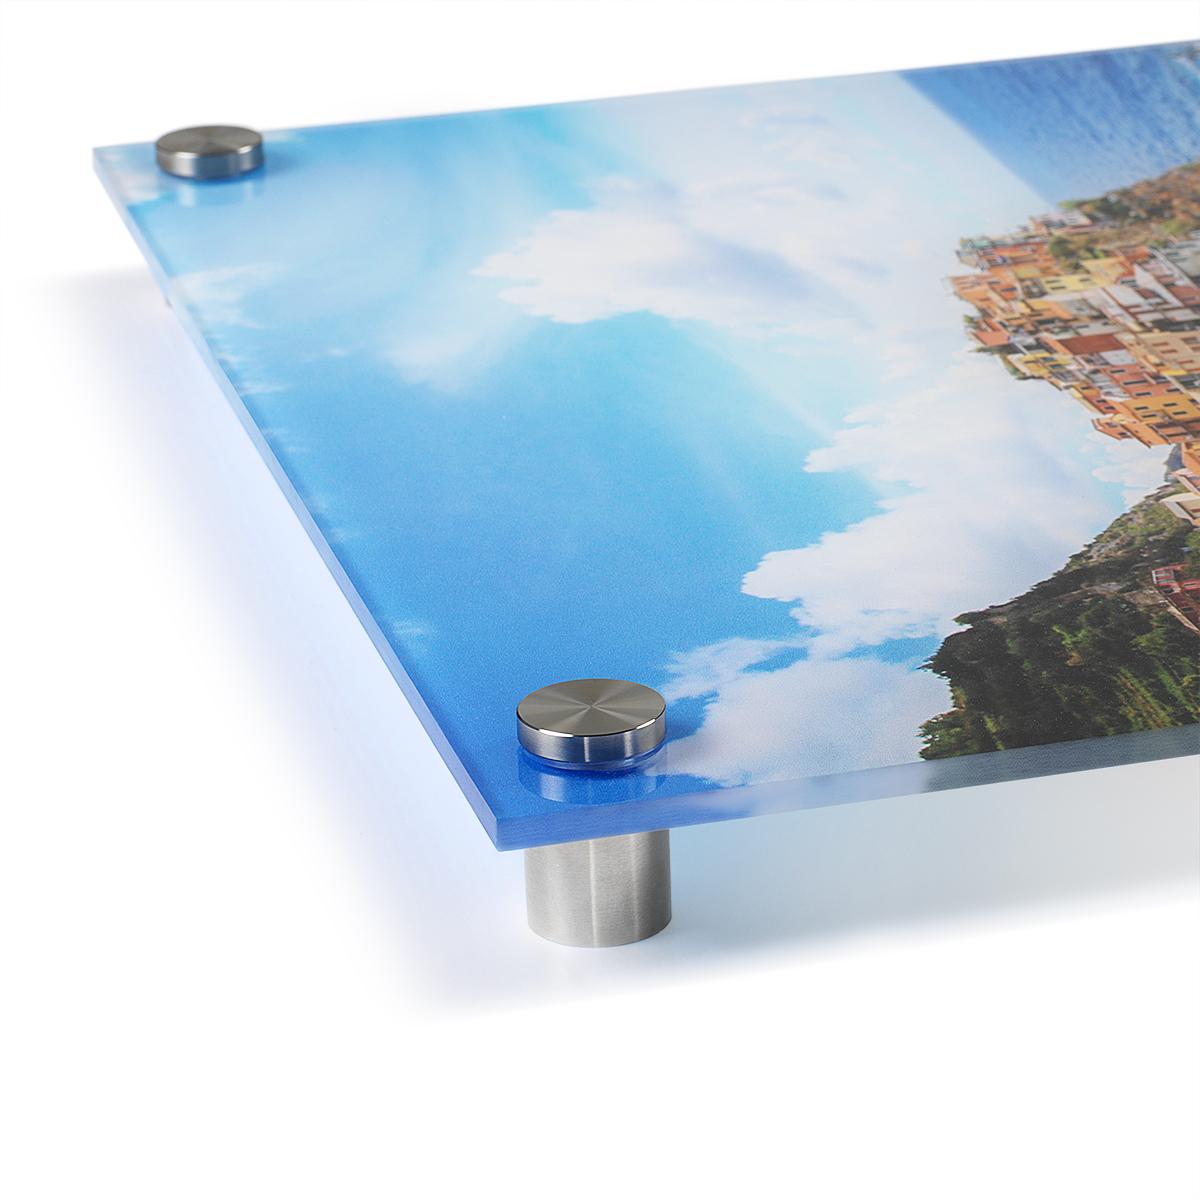 Corner Standoff Salon Mounting of ArtisanHD Direct to Acrylic Prints